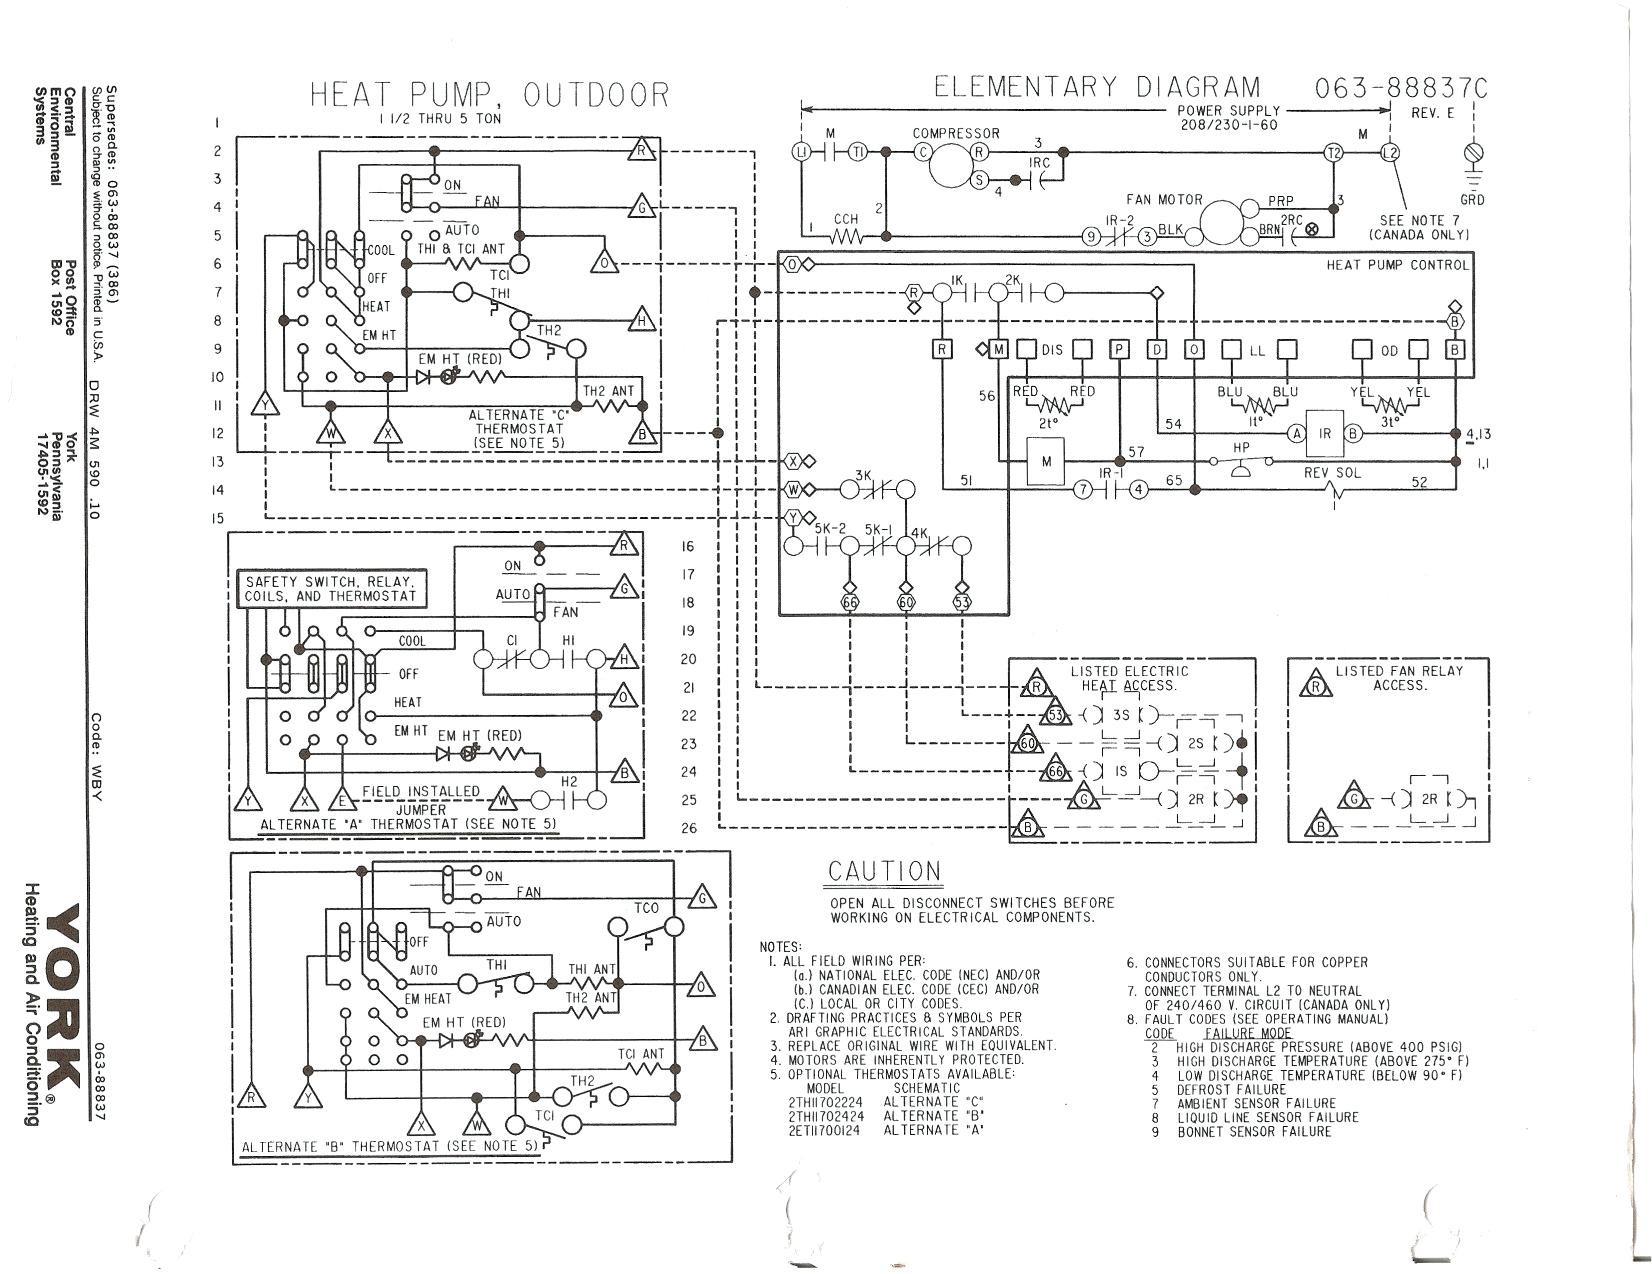 Ac Low Voltage Wiring Diagram Ac Unit Wiring Diagram Goodman Split Type Air Conditioning Of Ac Low Voltage Wiring Diagram